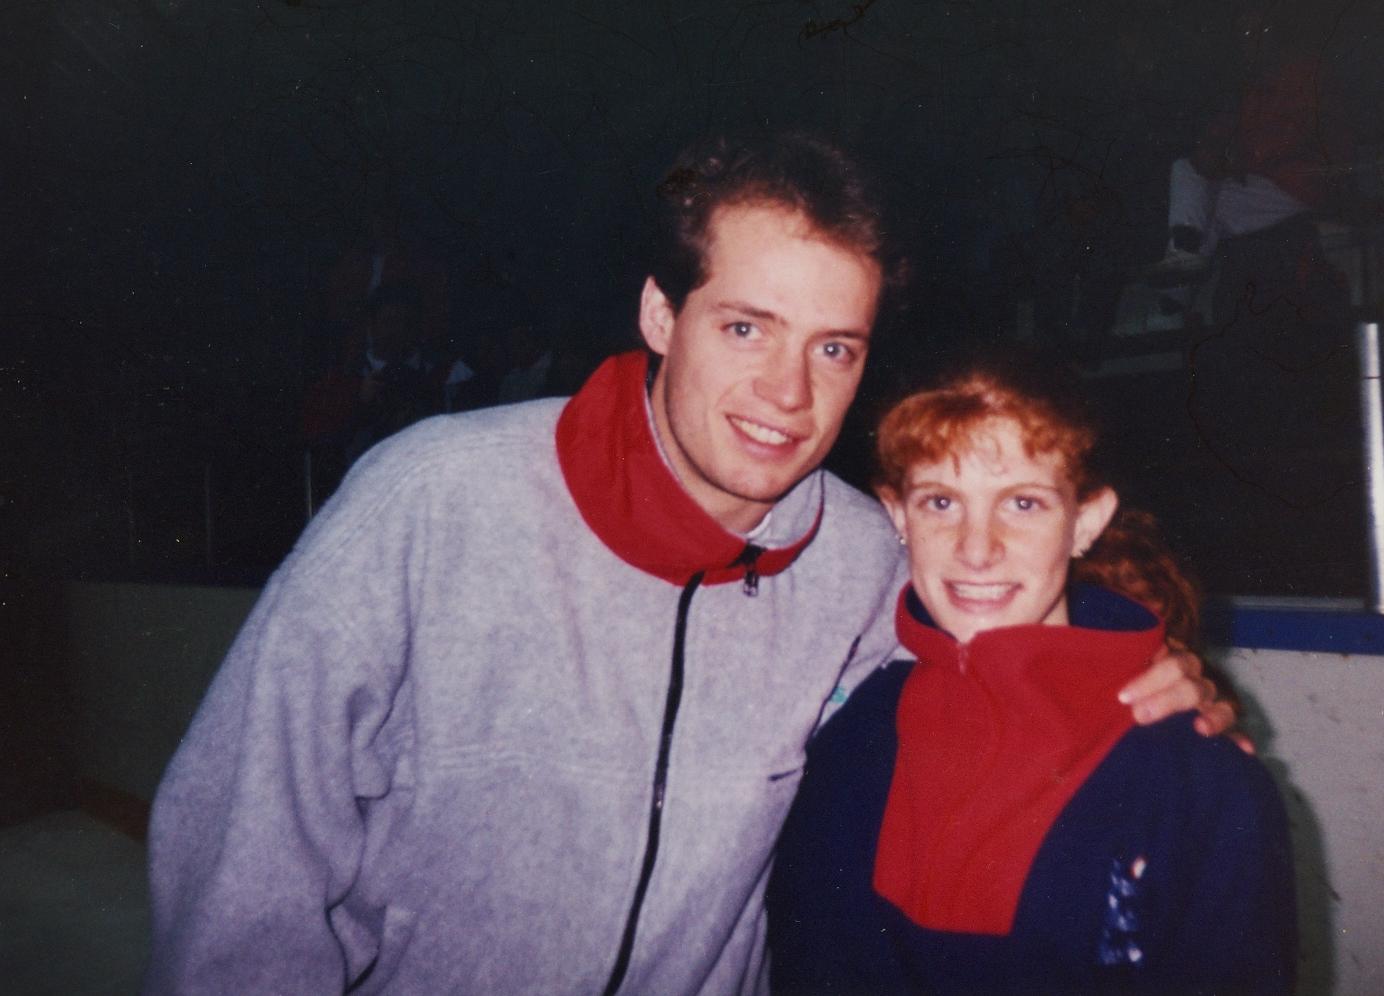 1993 Stefanie Partridge & Kurt Browning, Toronto